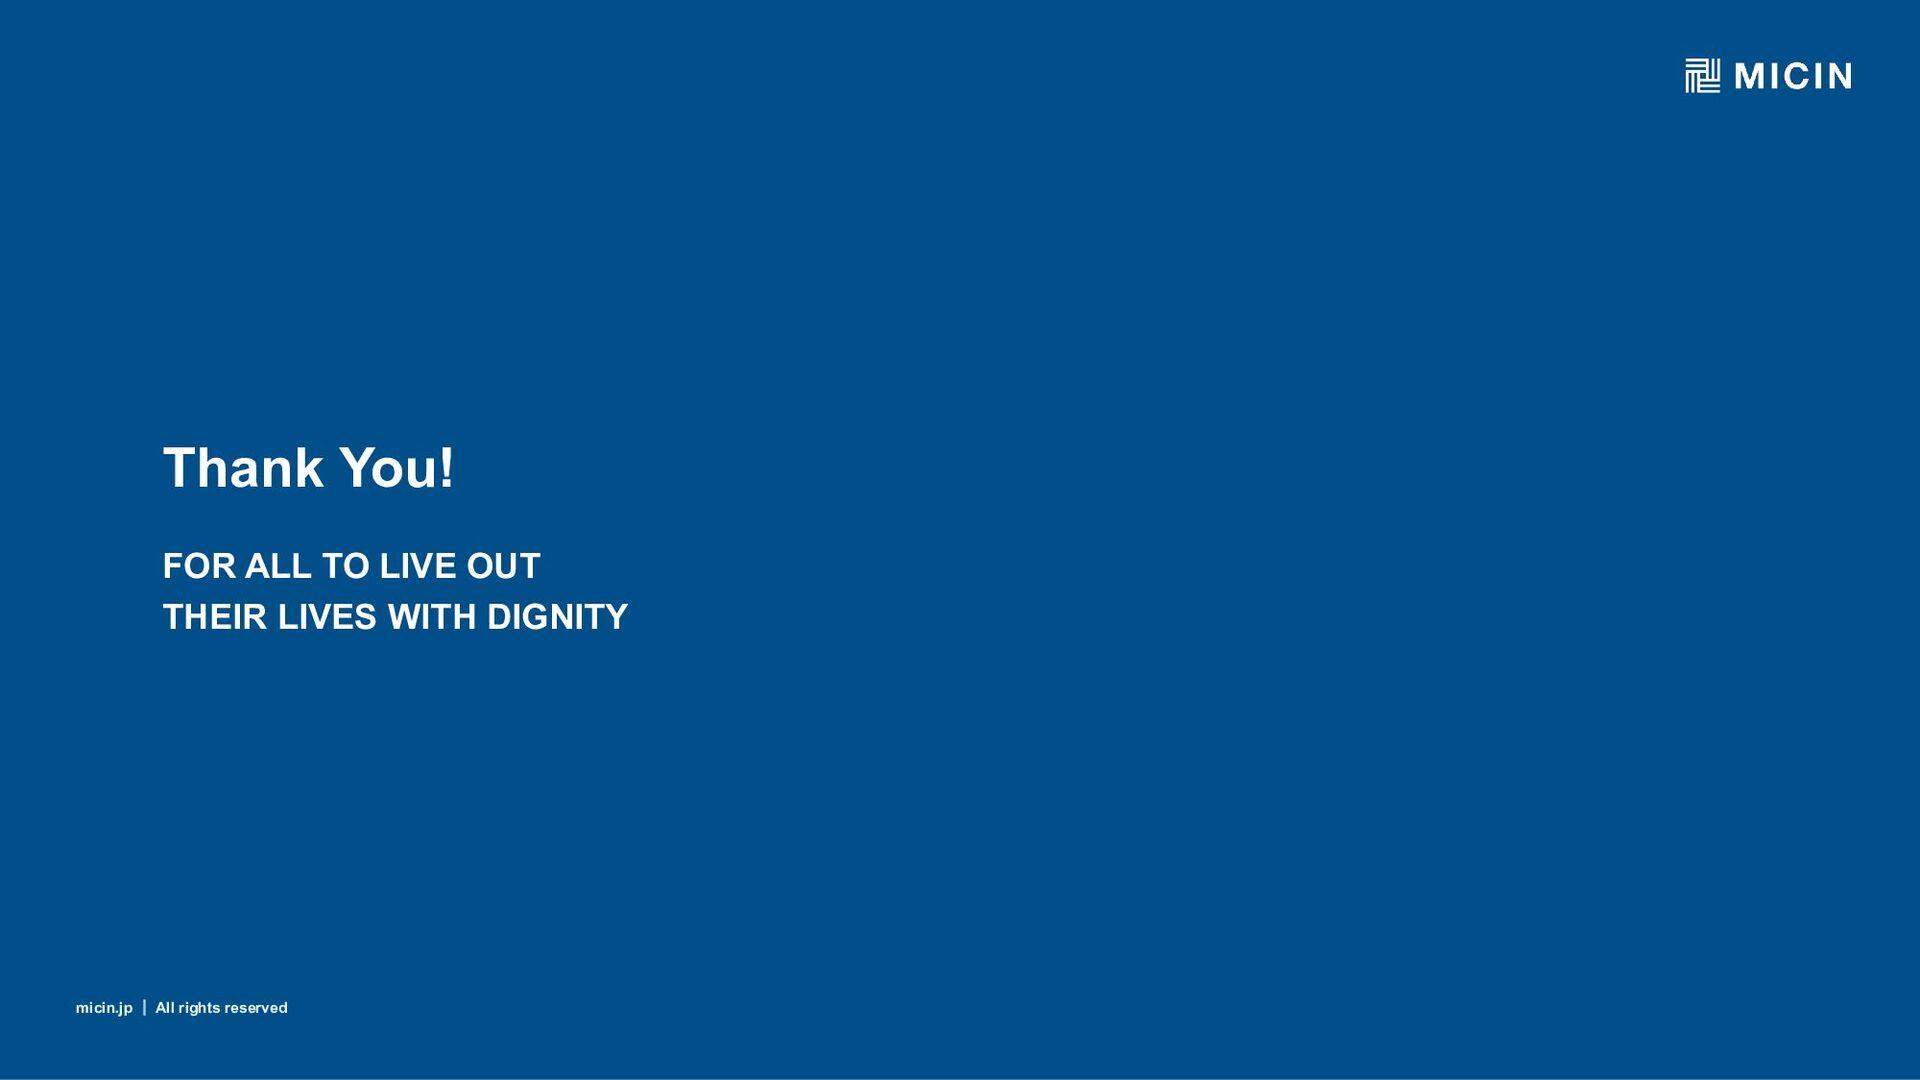 micin.jp ʛ All rights reserved 58 最新の採⽤情報・応募 05...